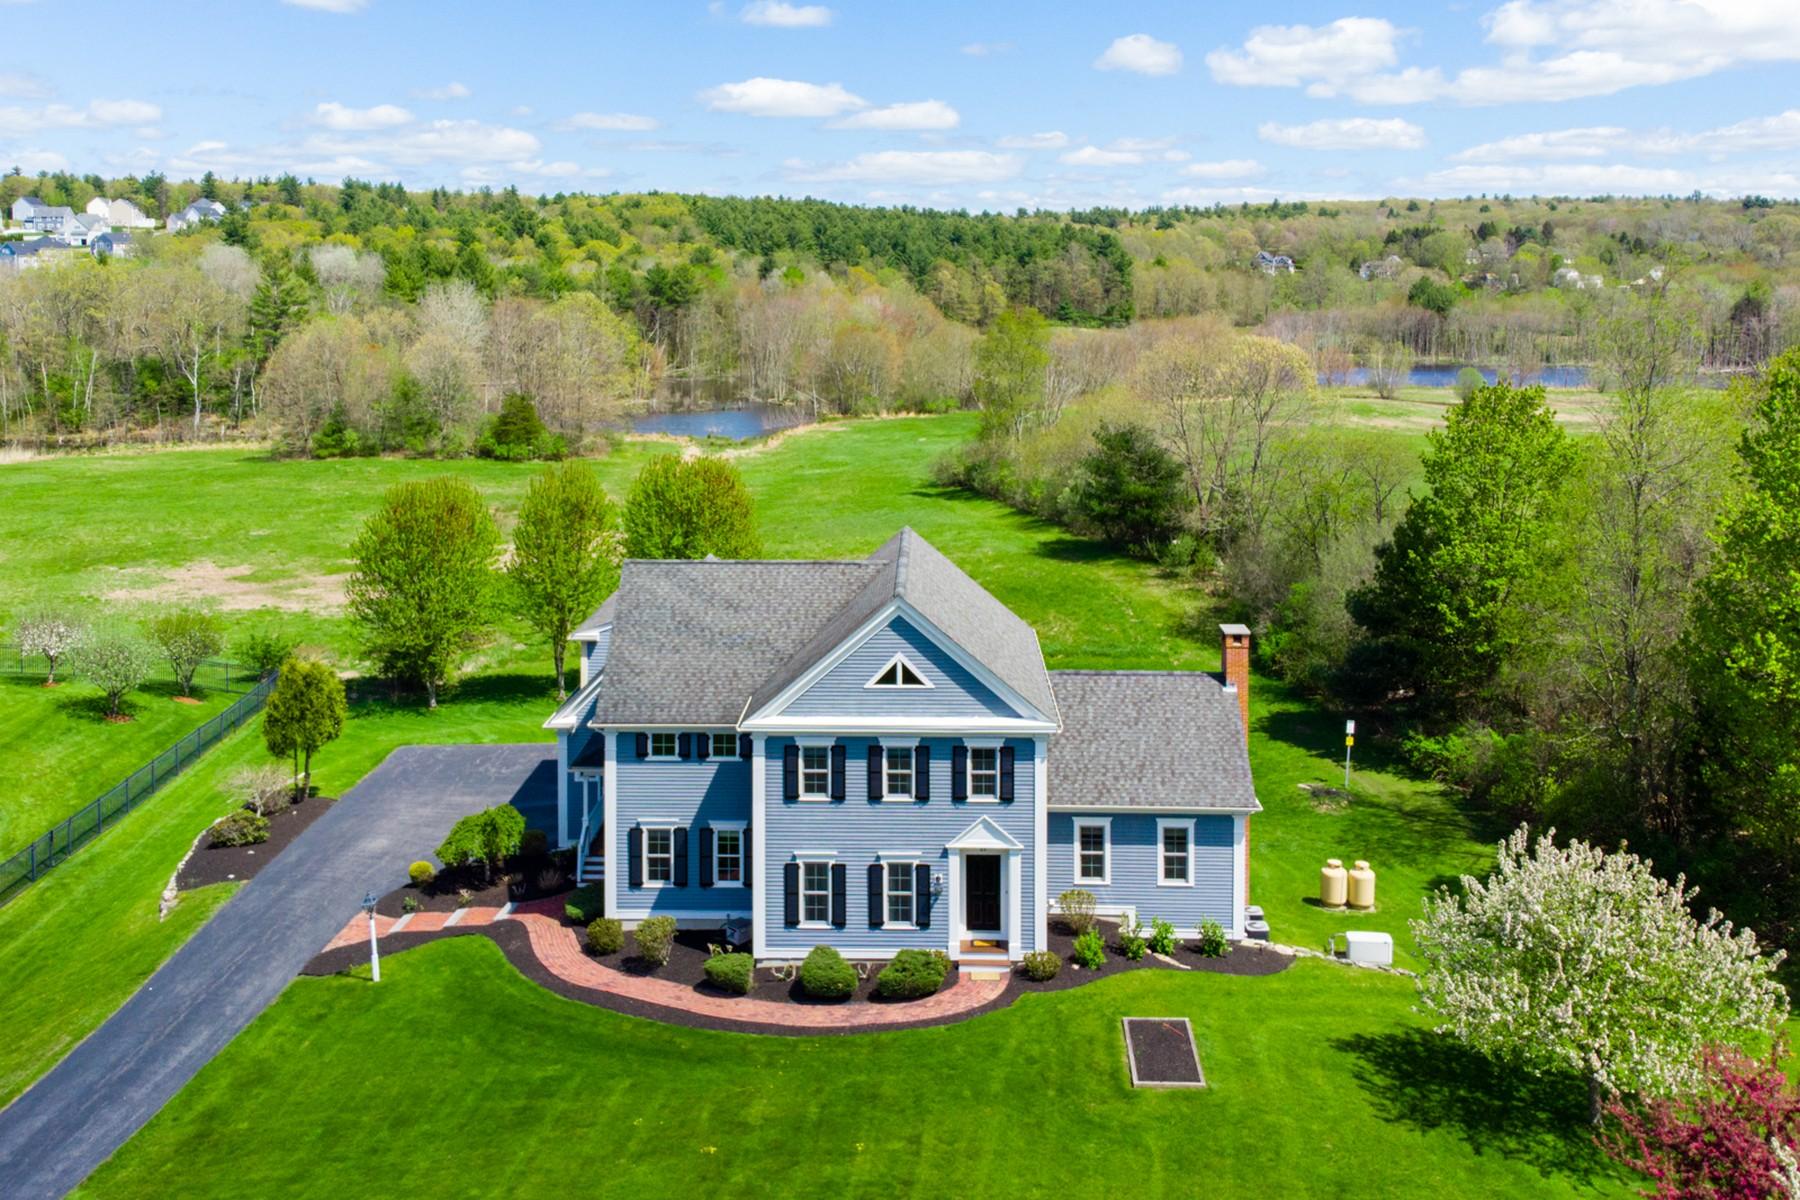 Single Family Homes のために 売買 アット Custom Pristine Colonial 48 Adams Rd, North Grafton, マサチューセッツ 01536 アメリカ